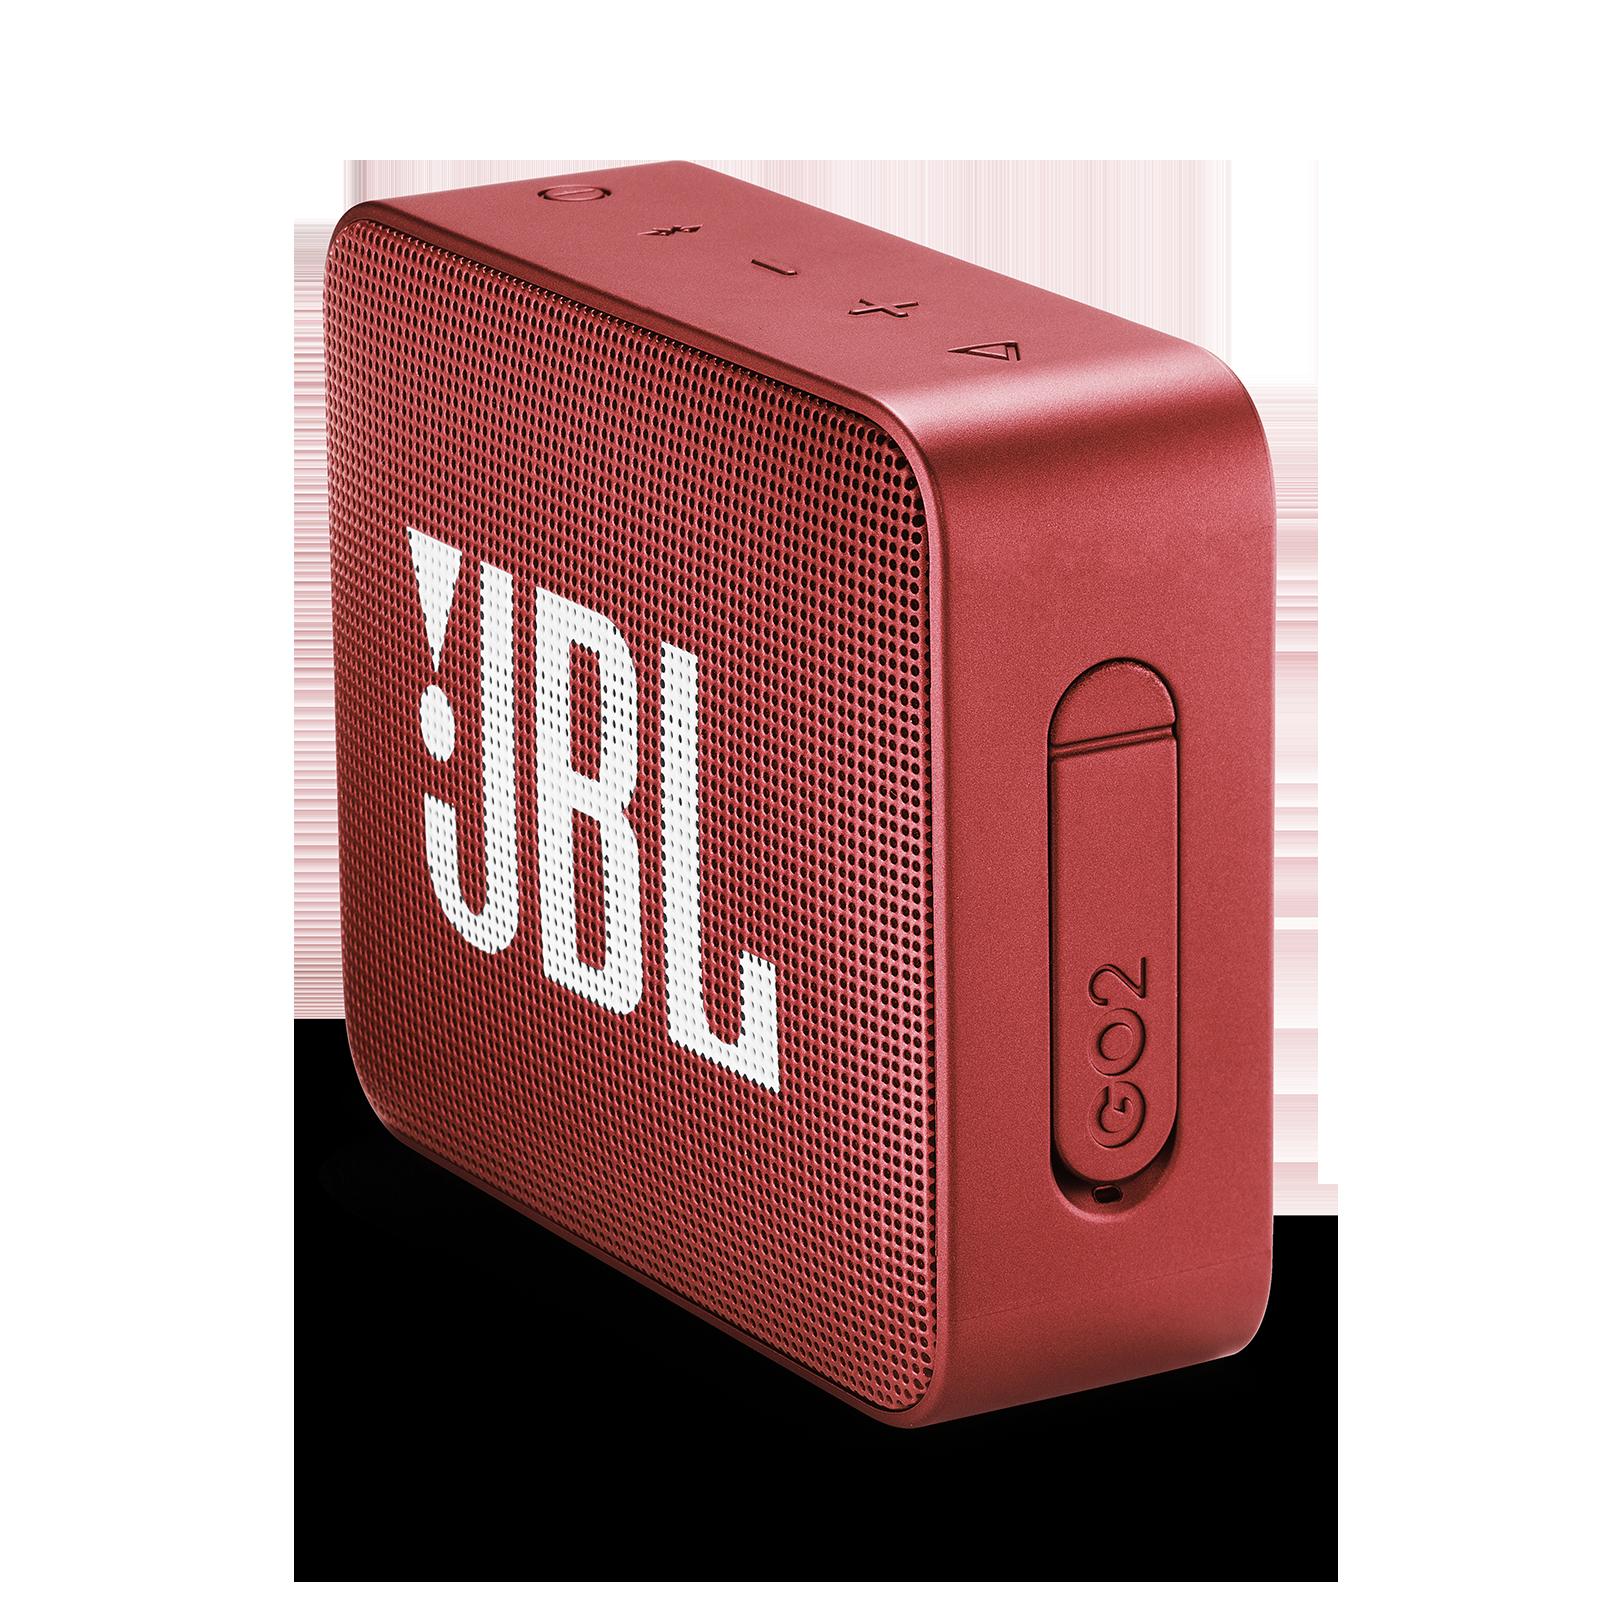 JBL GO 2 - Ruby Red - Portable Bluetooth speaker - Detailshot 2